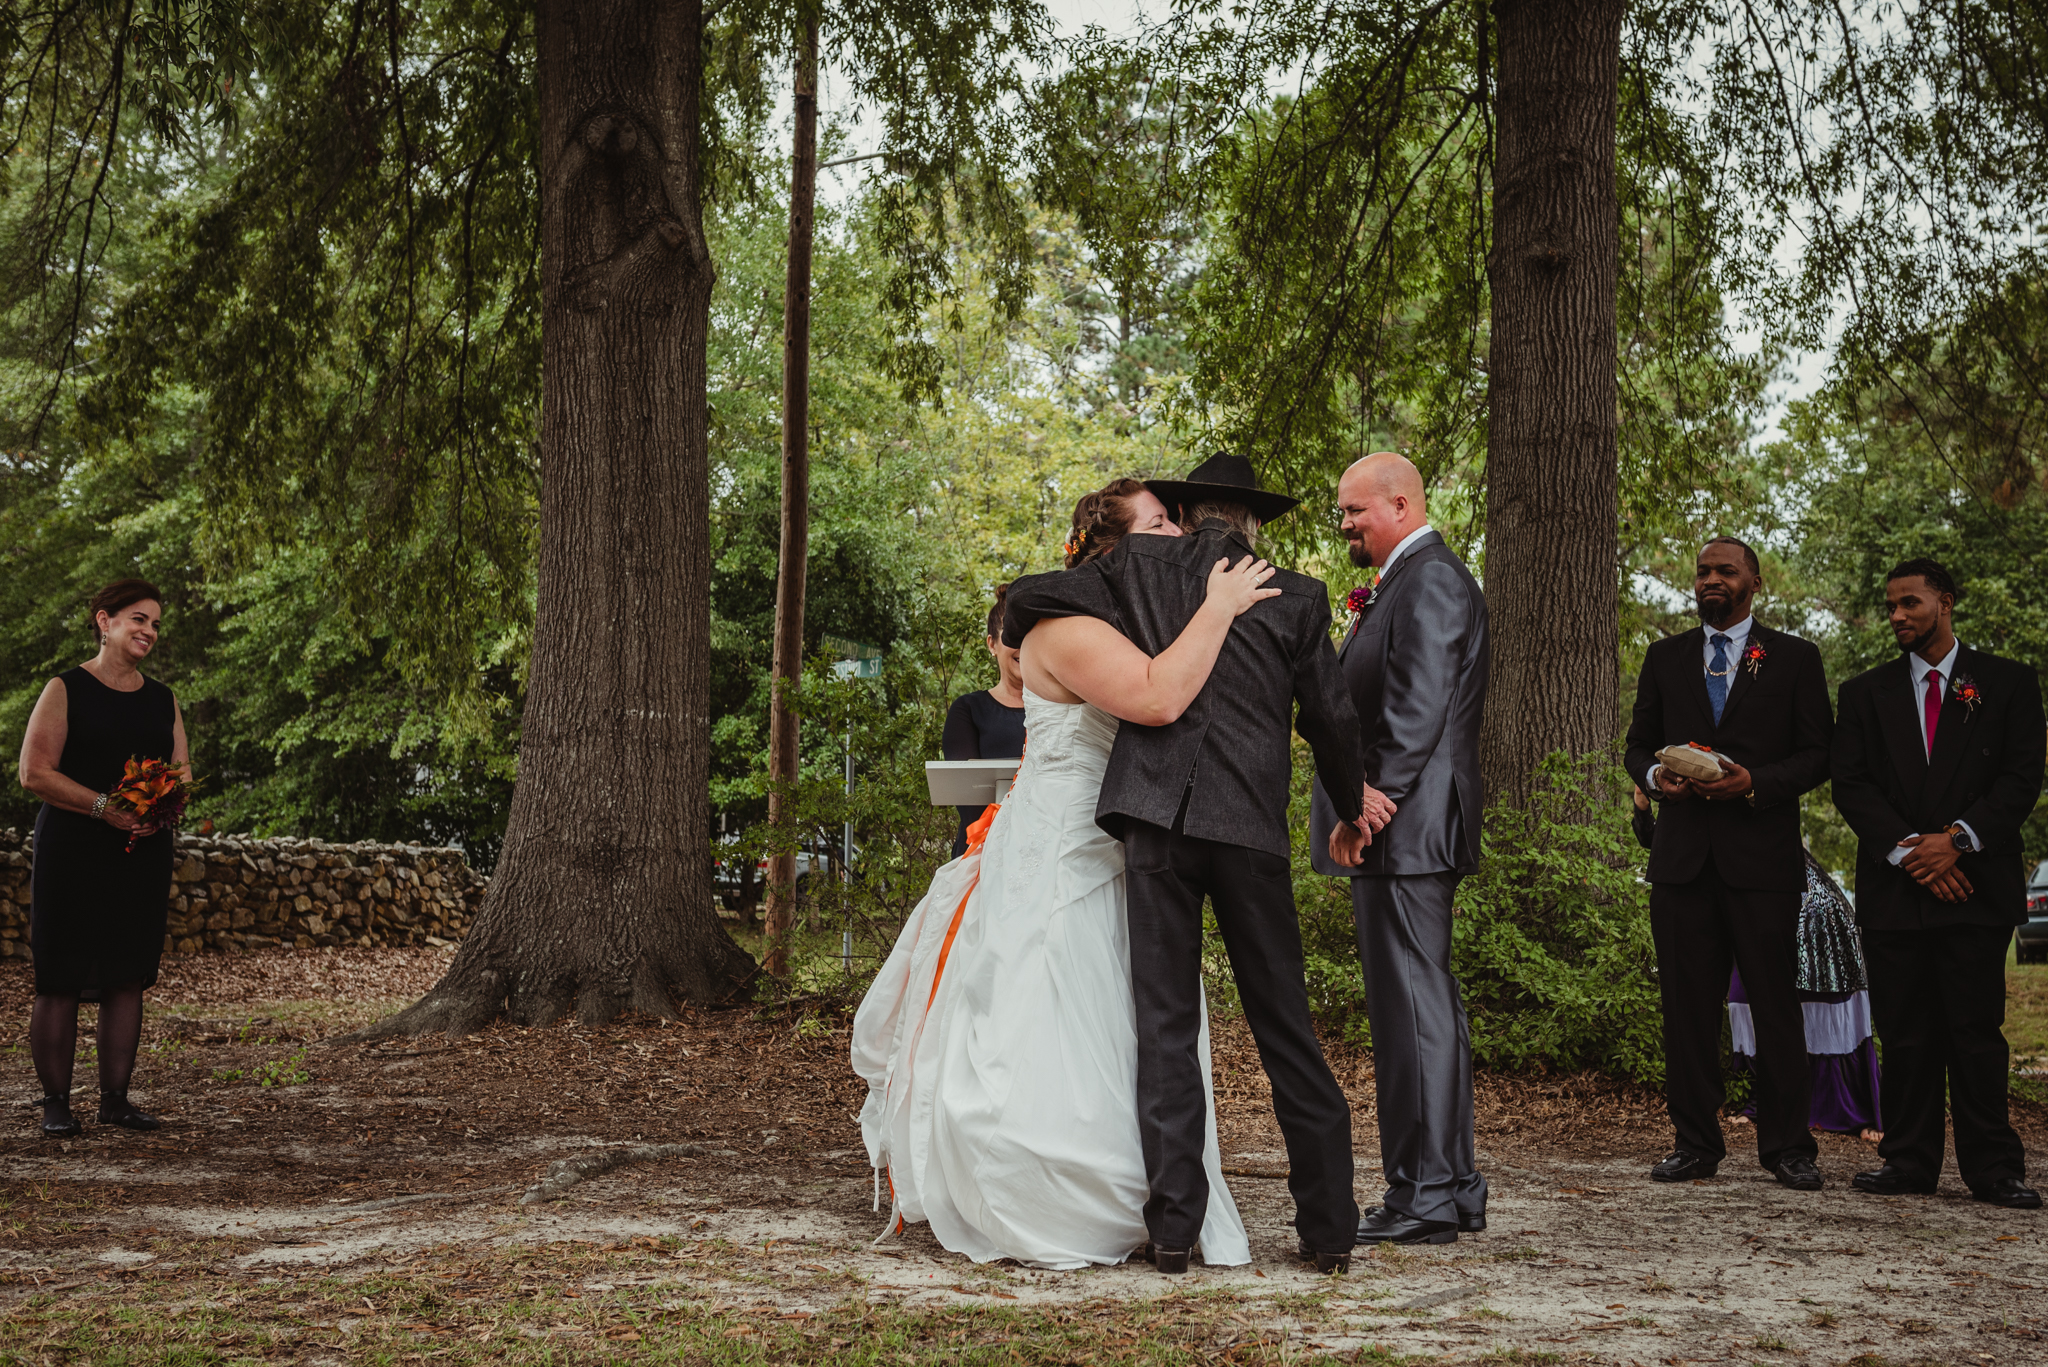 raleigh-wedding-father-hug-at-ceremony-cd.jpg